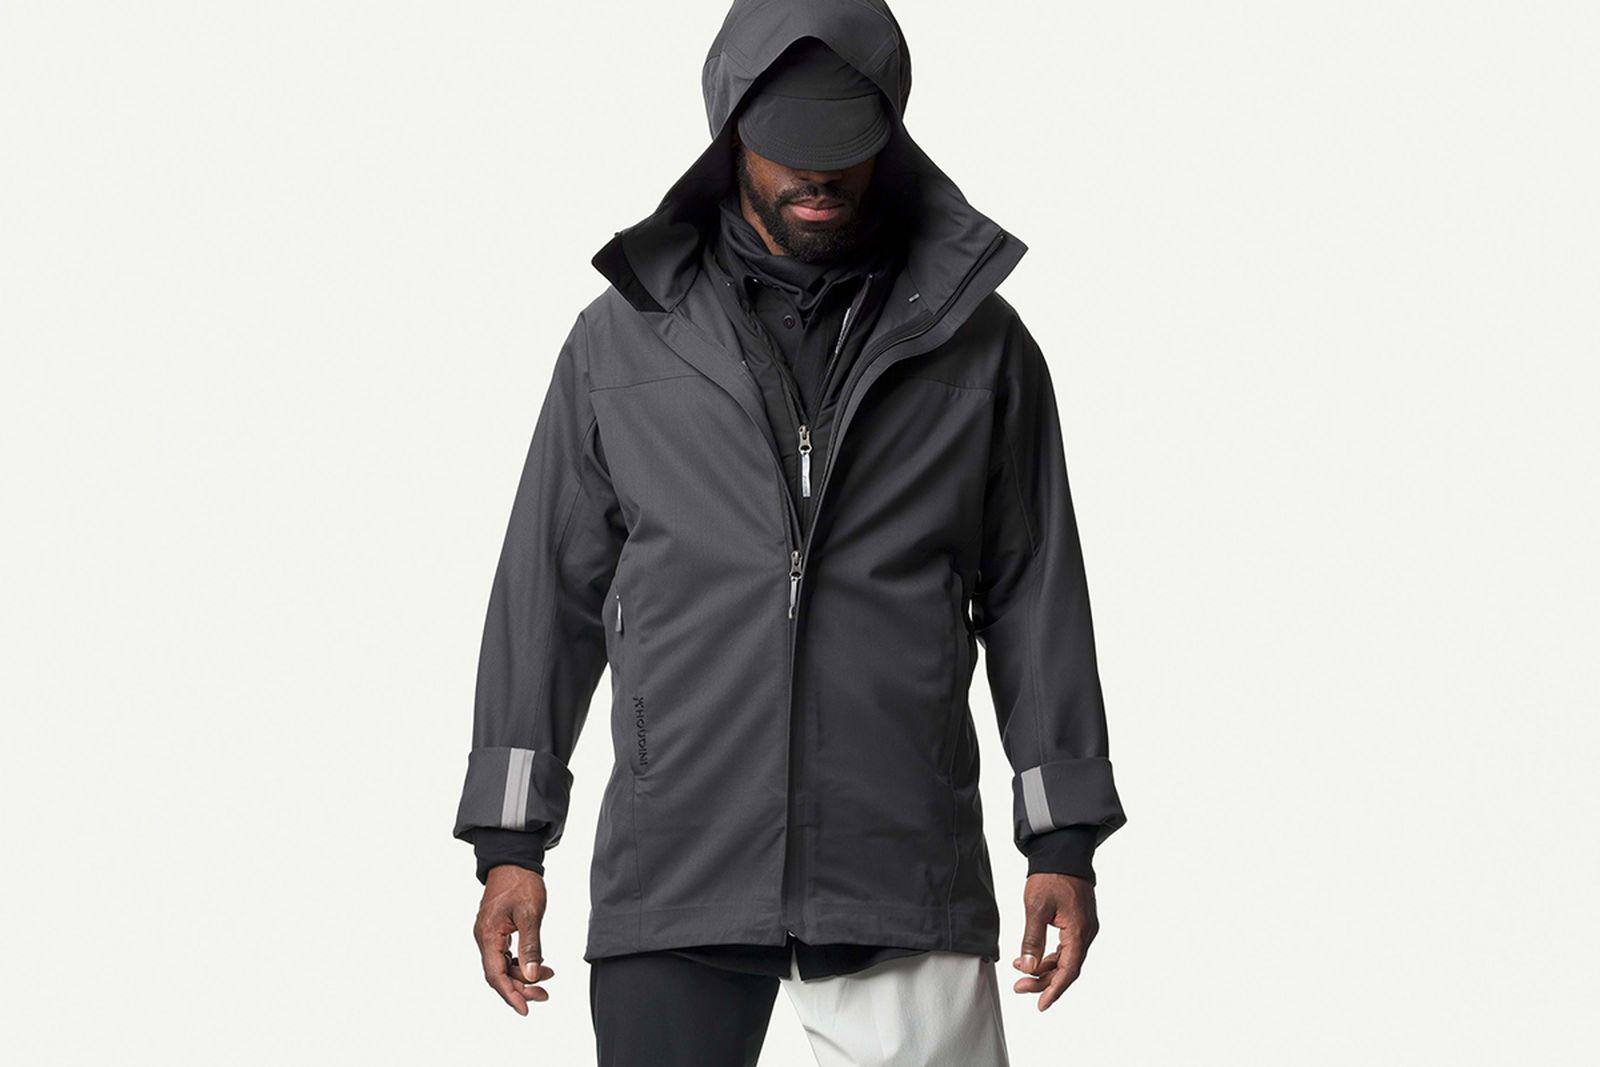 main01 Beyond clothing The Woolmark Company burberry